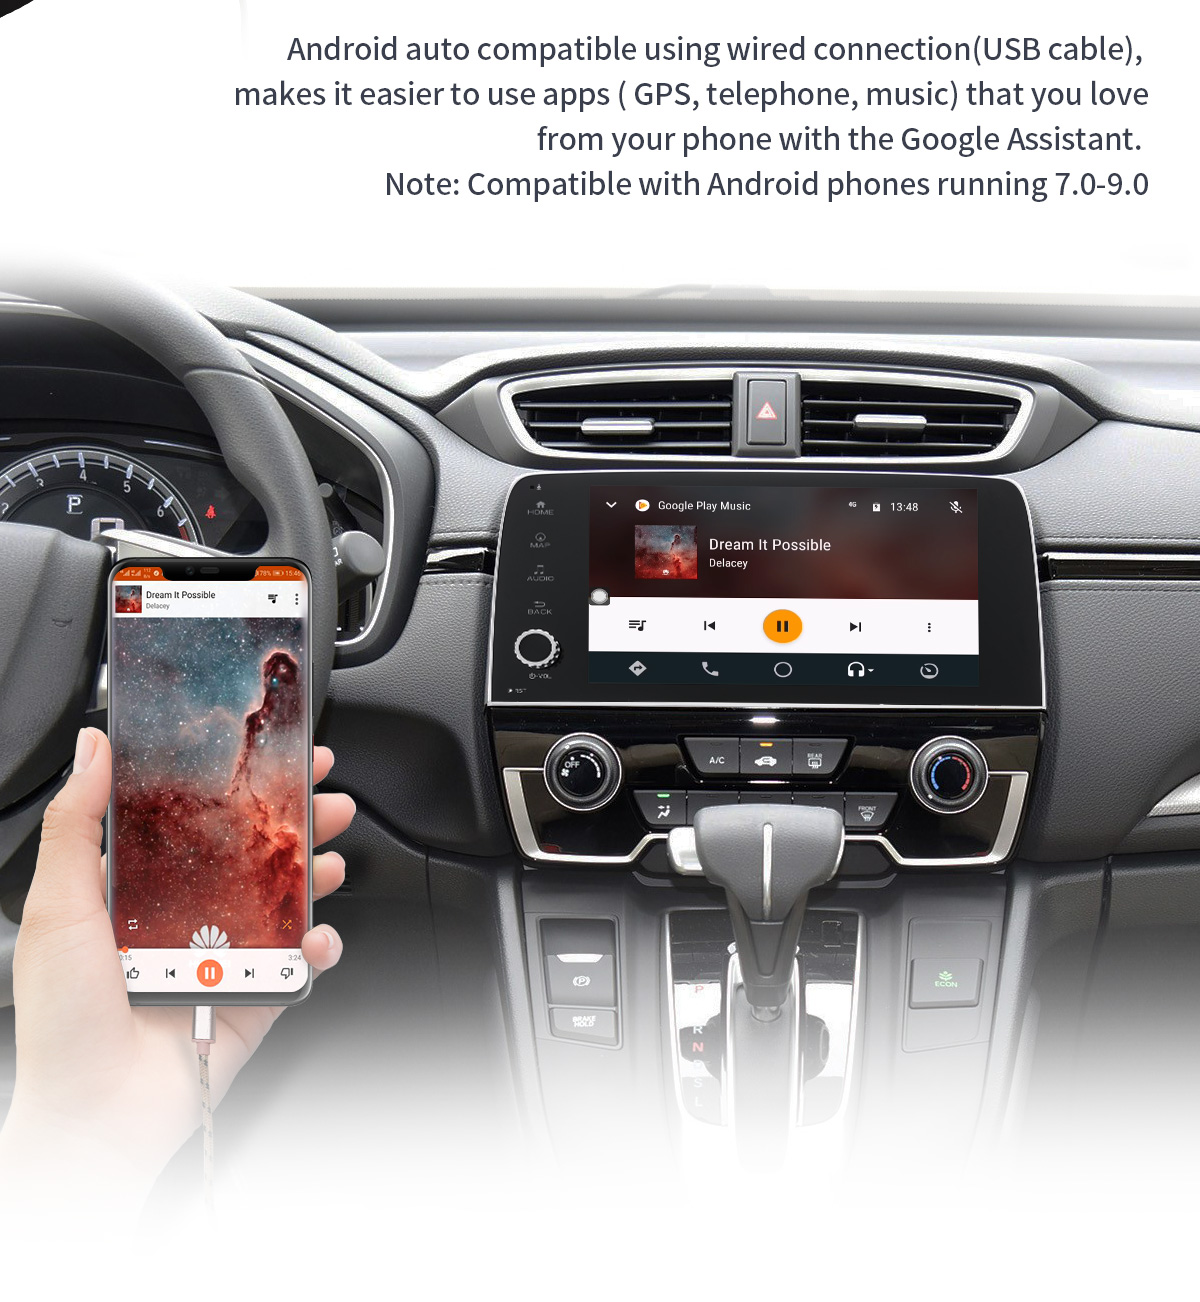 JOYING Android 8 1 0 Plug And Play Car Entertainment System for 2016 2017  Honda CRV 4GB+64GB